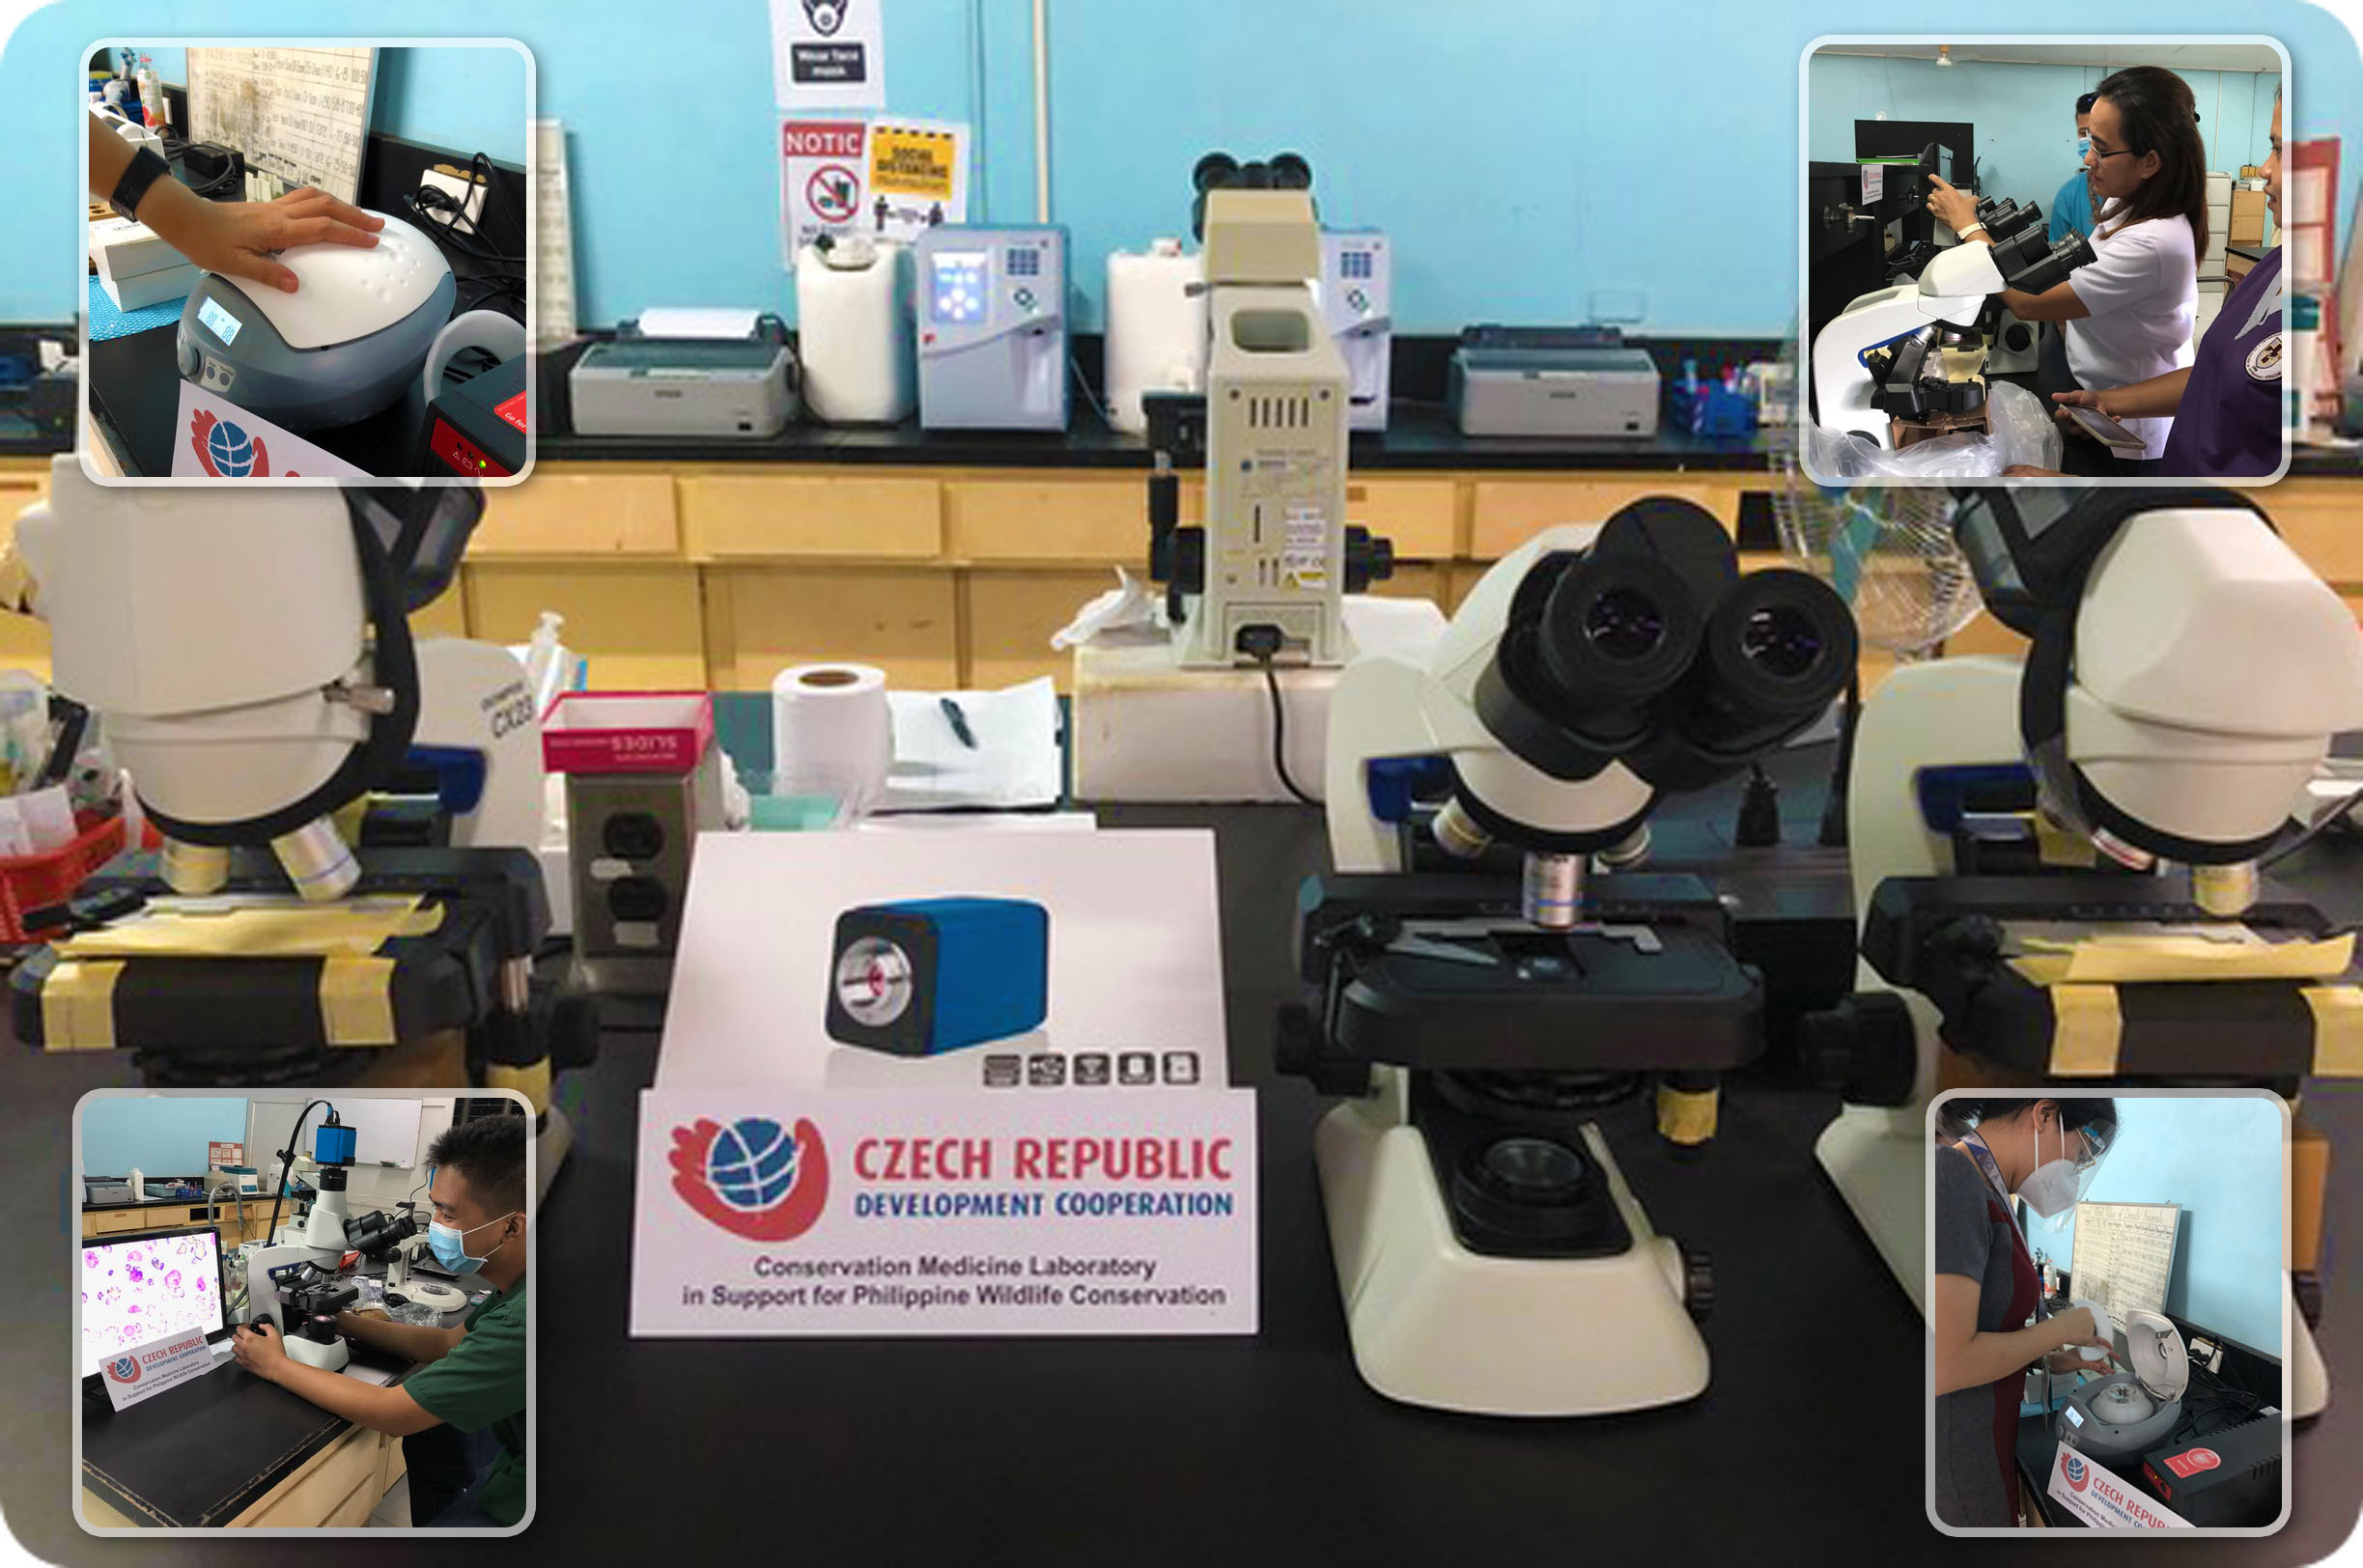 Microscopes for the Conservation Medicine Laboratory